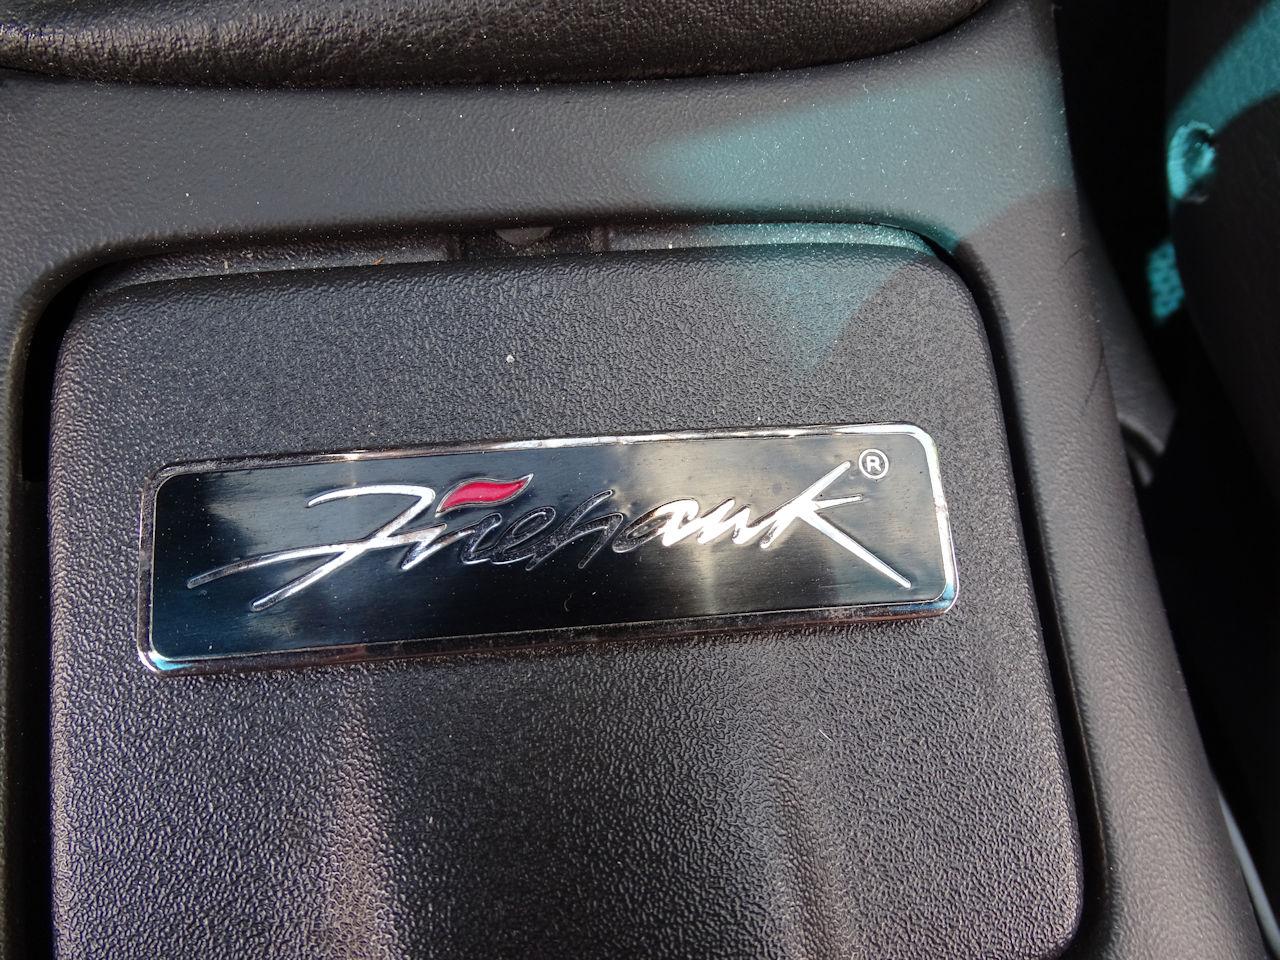 2001 Pontiac Firebird 64